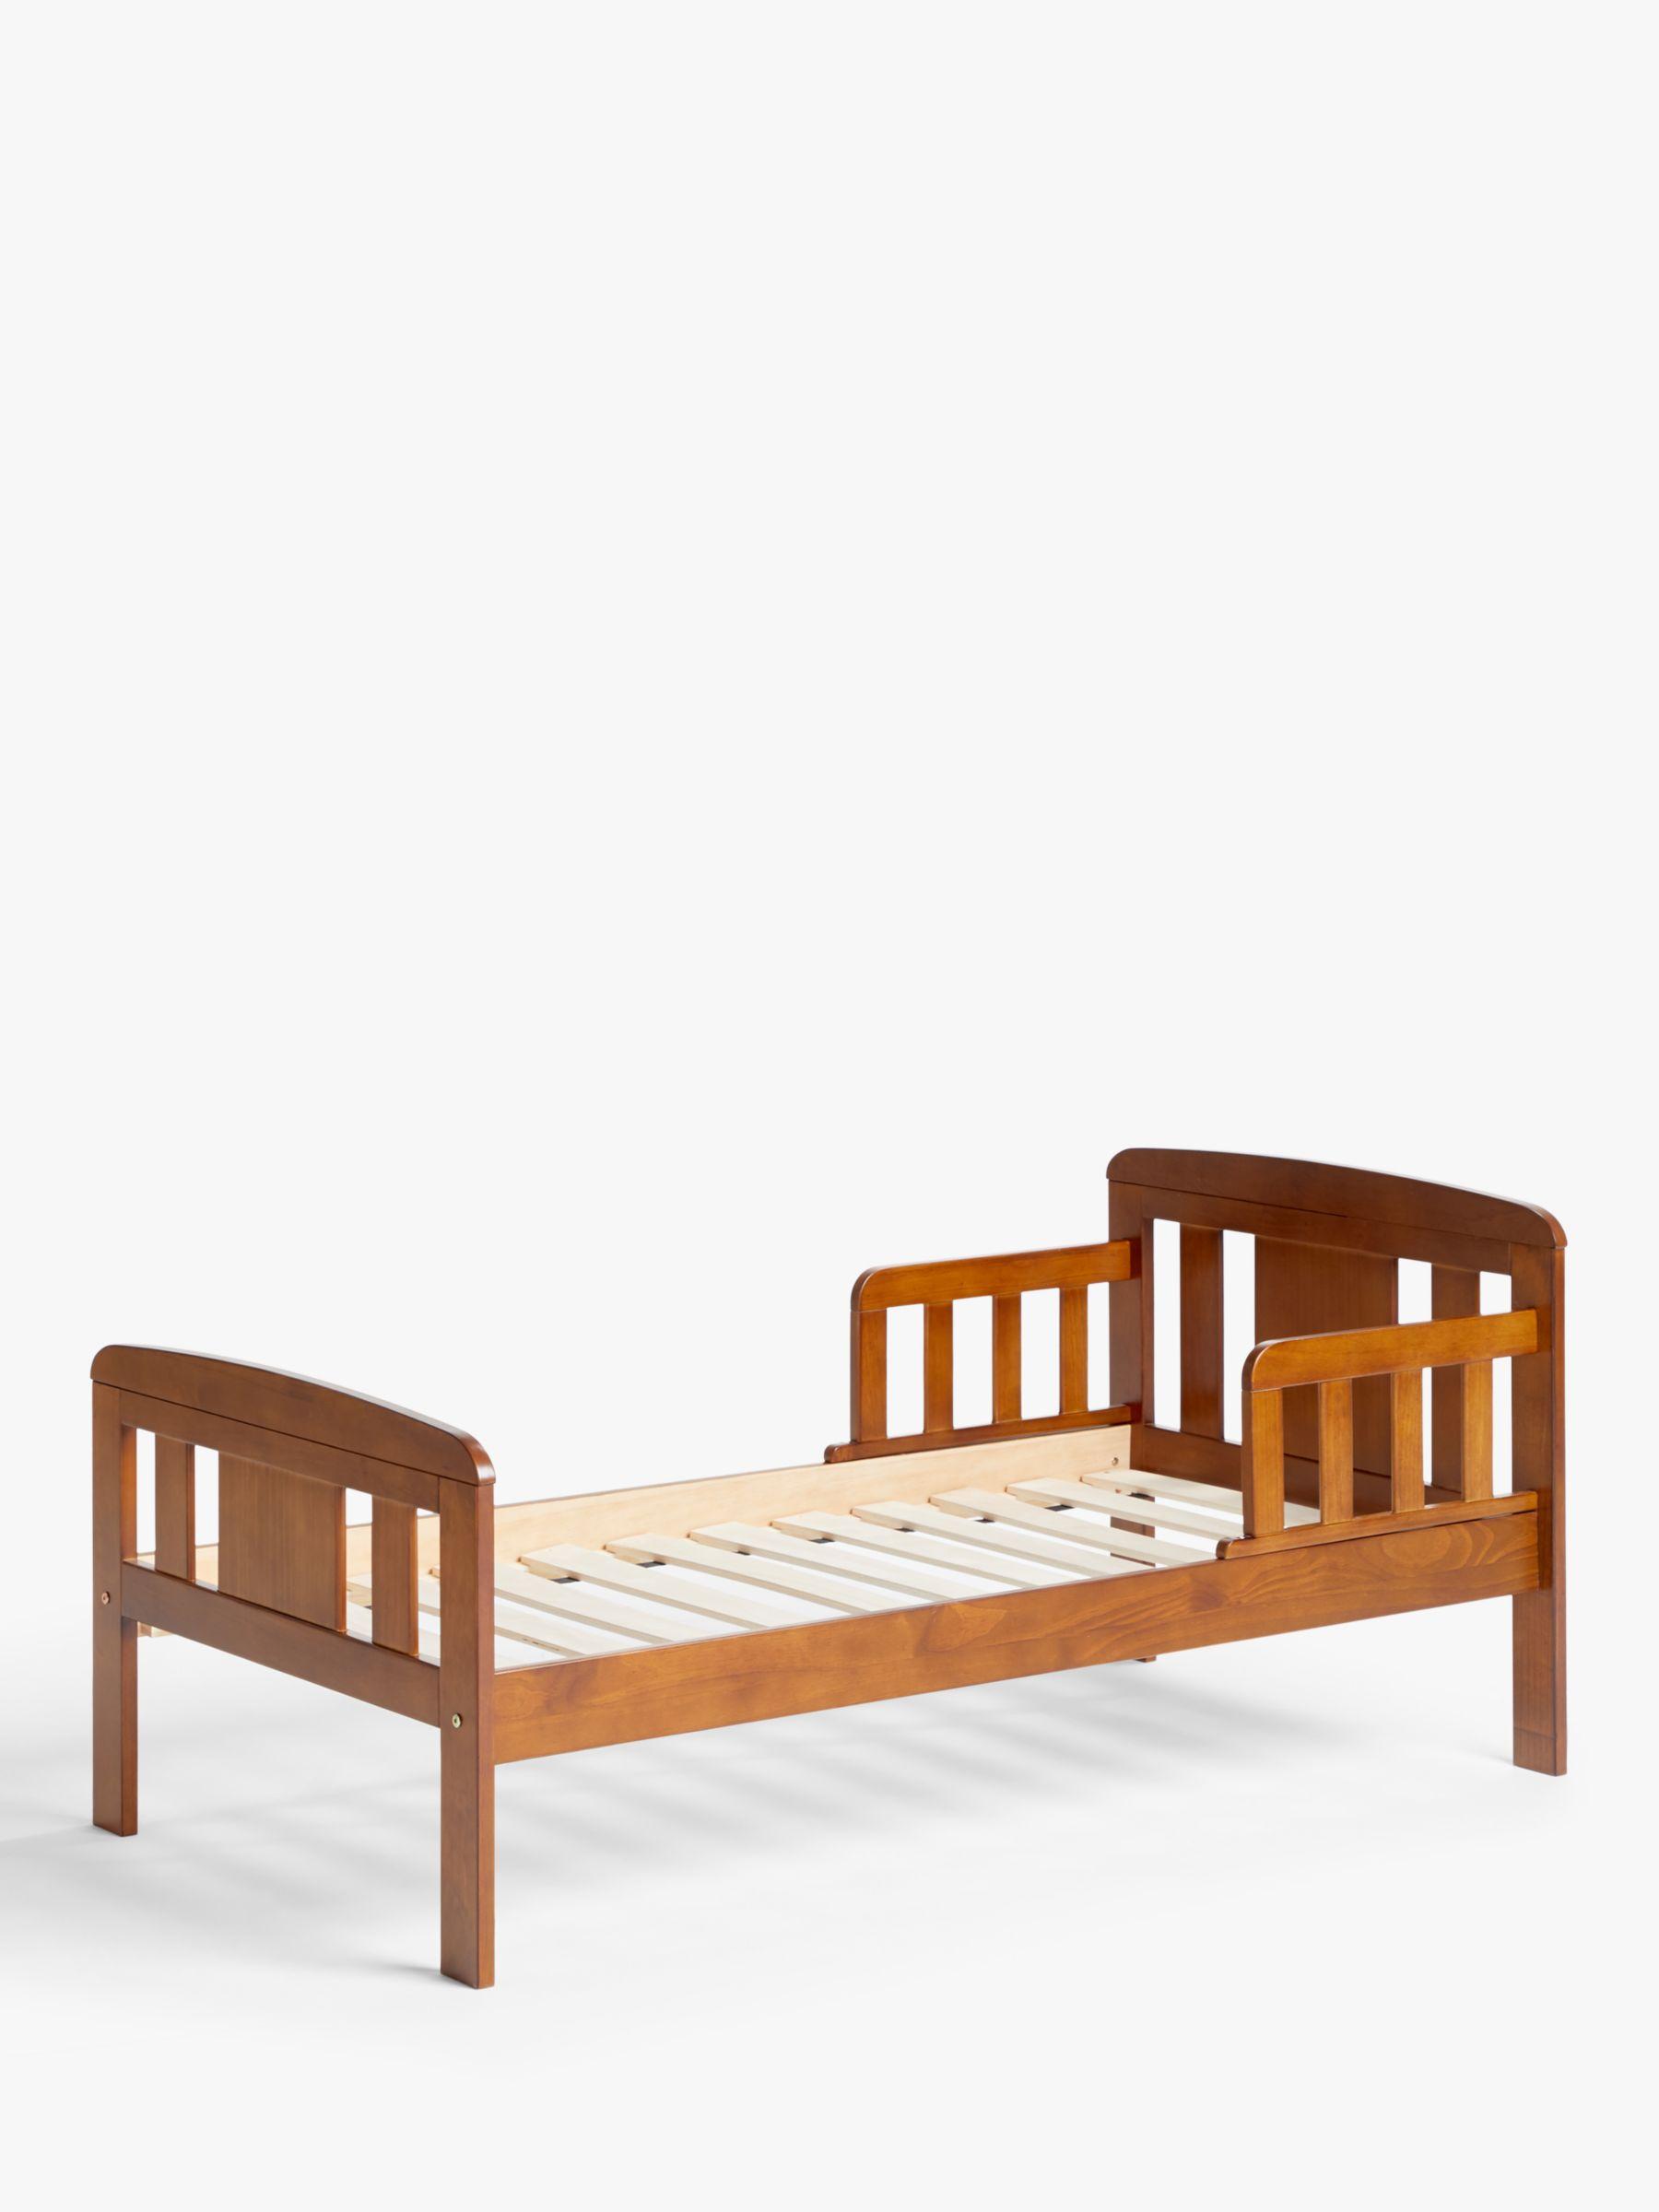 buy popular 054a2 877db John Lewis & Partners Boris Toddler Bed, Antique Darkwood